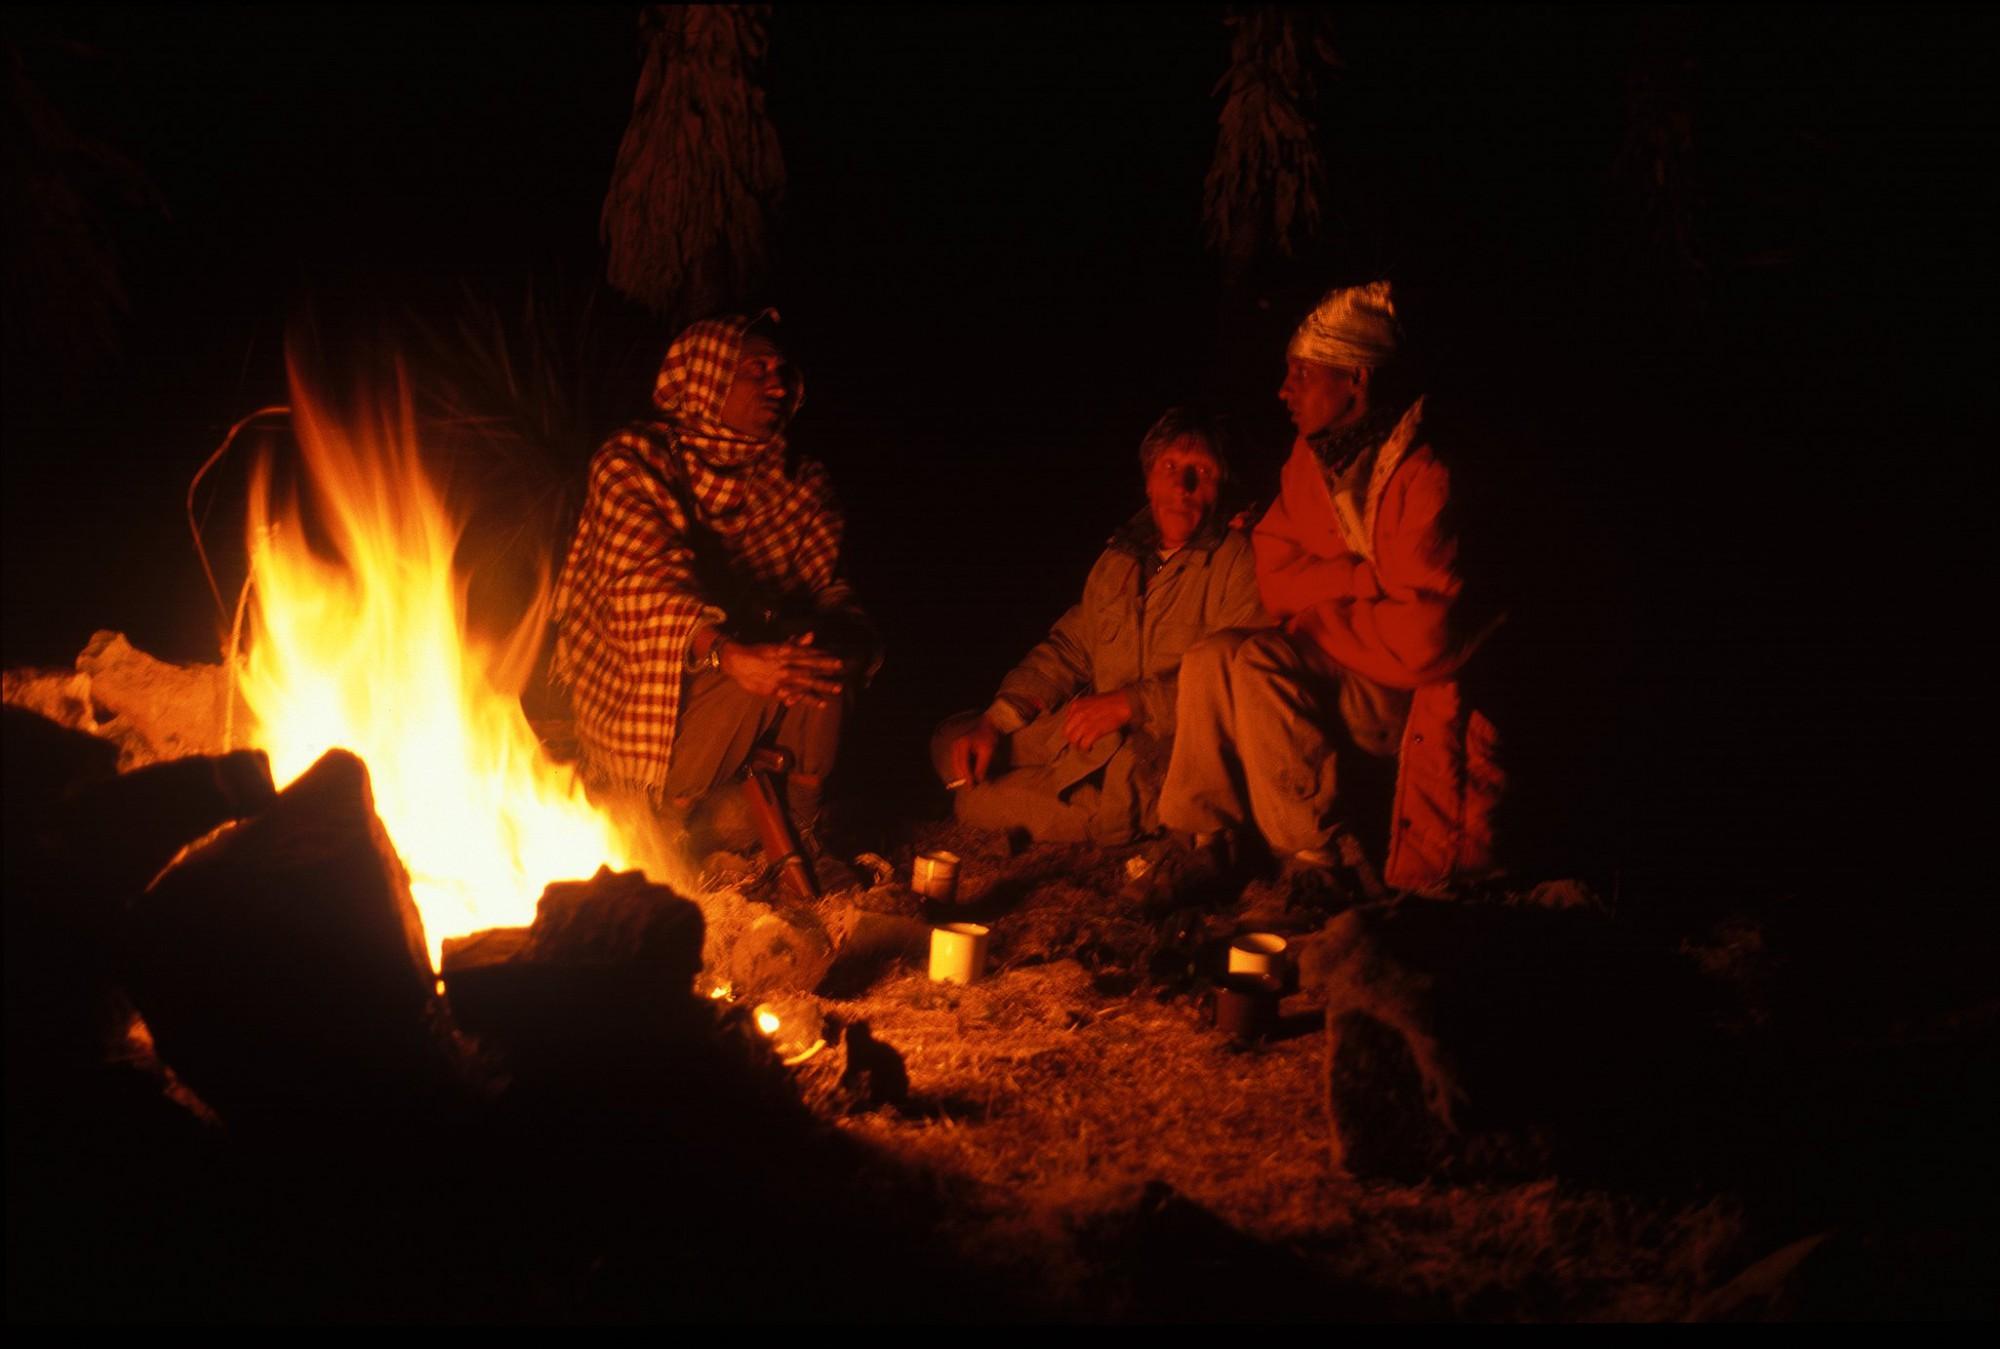 Afbeelding: Dominique Van Huffel, reisfotografie-reportage, Ethiopië.